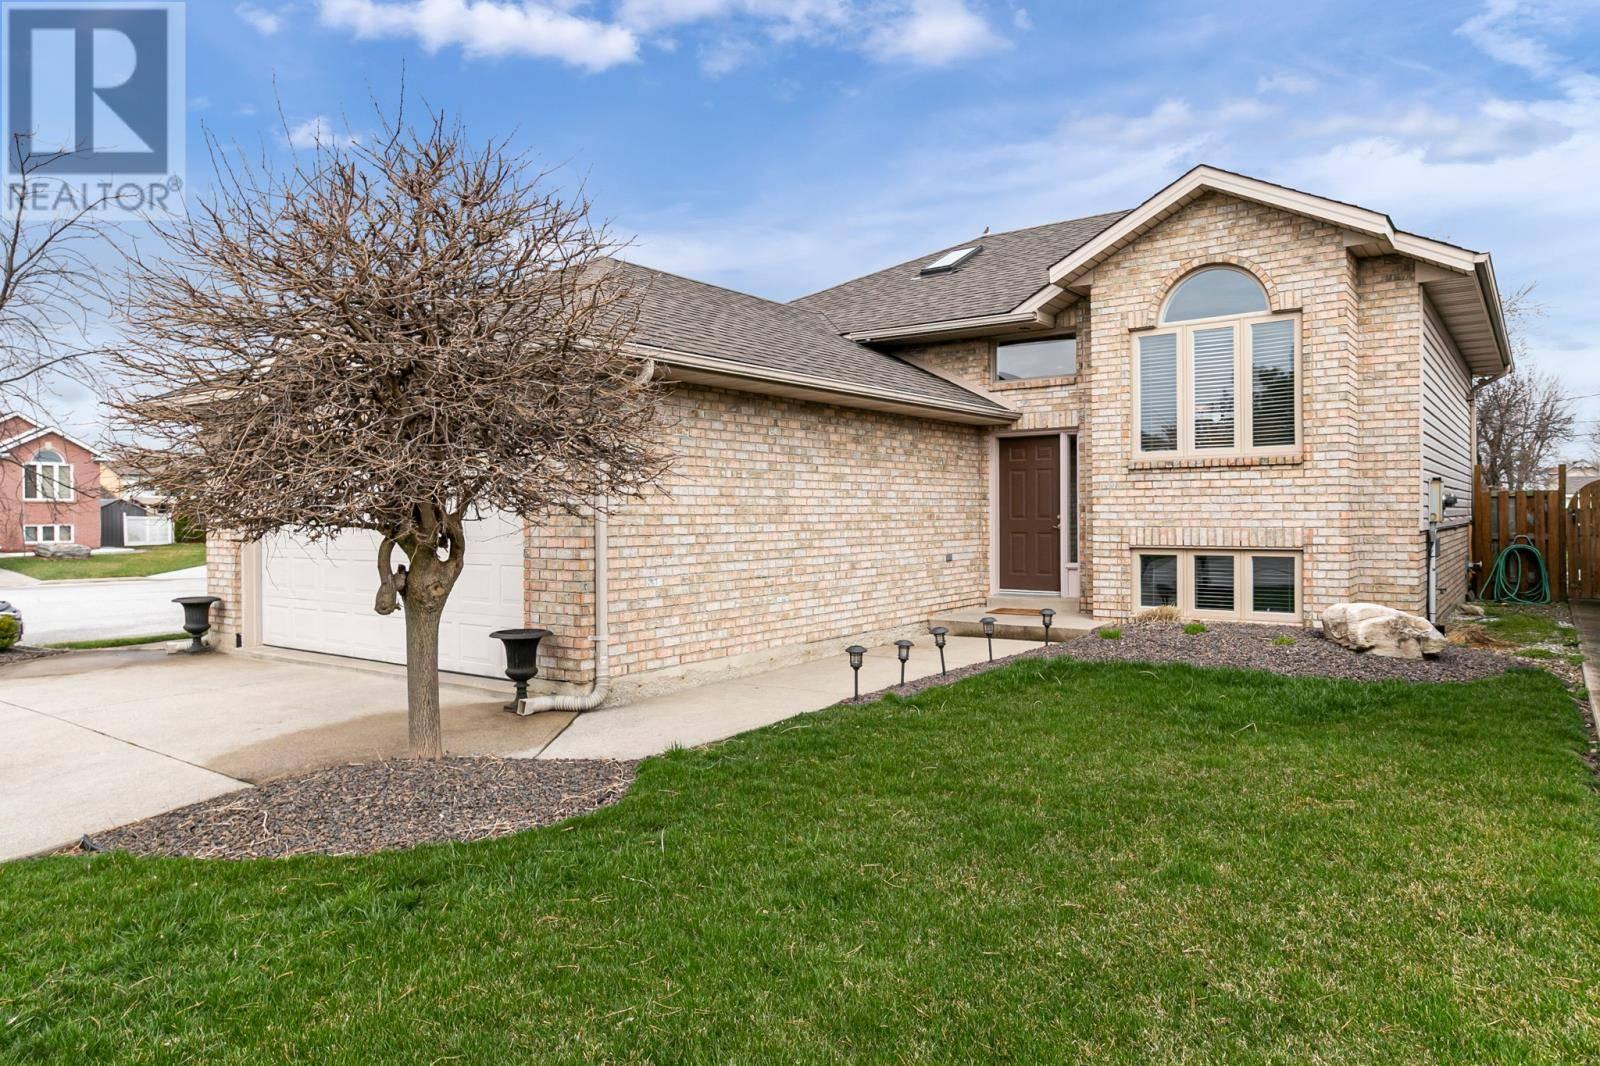 House for sale at 12330 Demarse Ct Tecumseh Ontario - MLS: 20003933